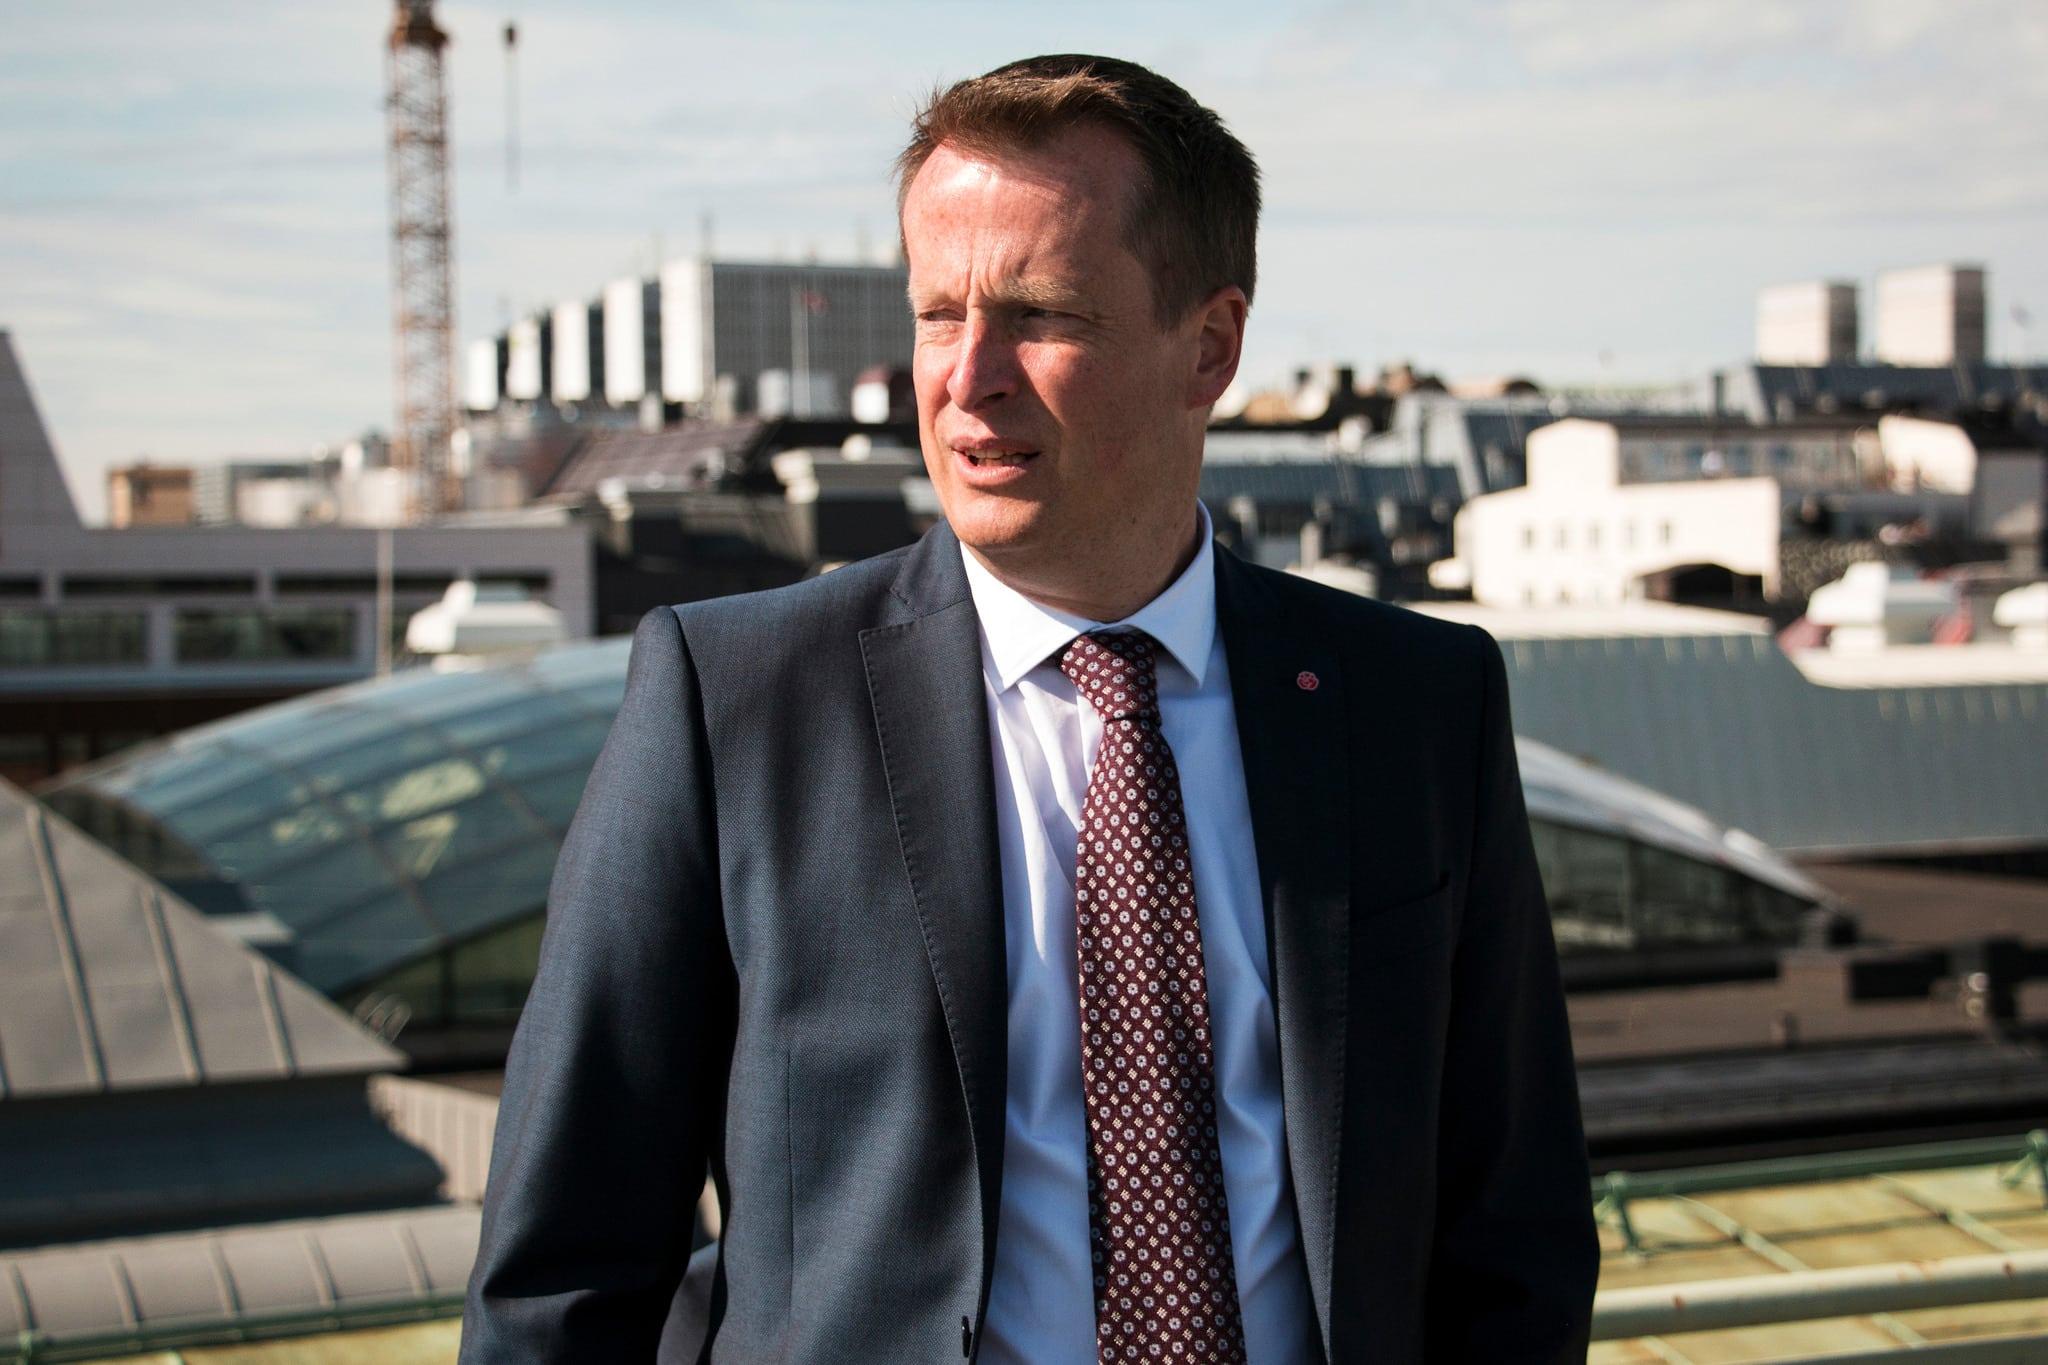 Inrikesminister Anders Ygeman. Foto: Bill Nilsson/Regeringskansliet